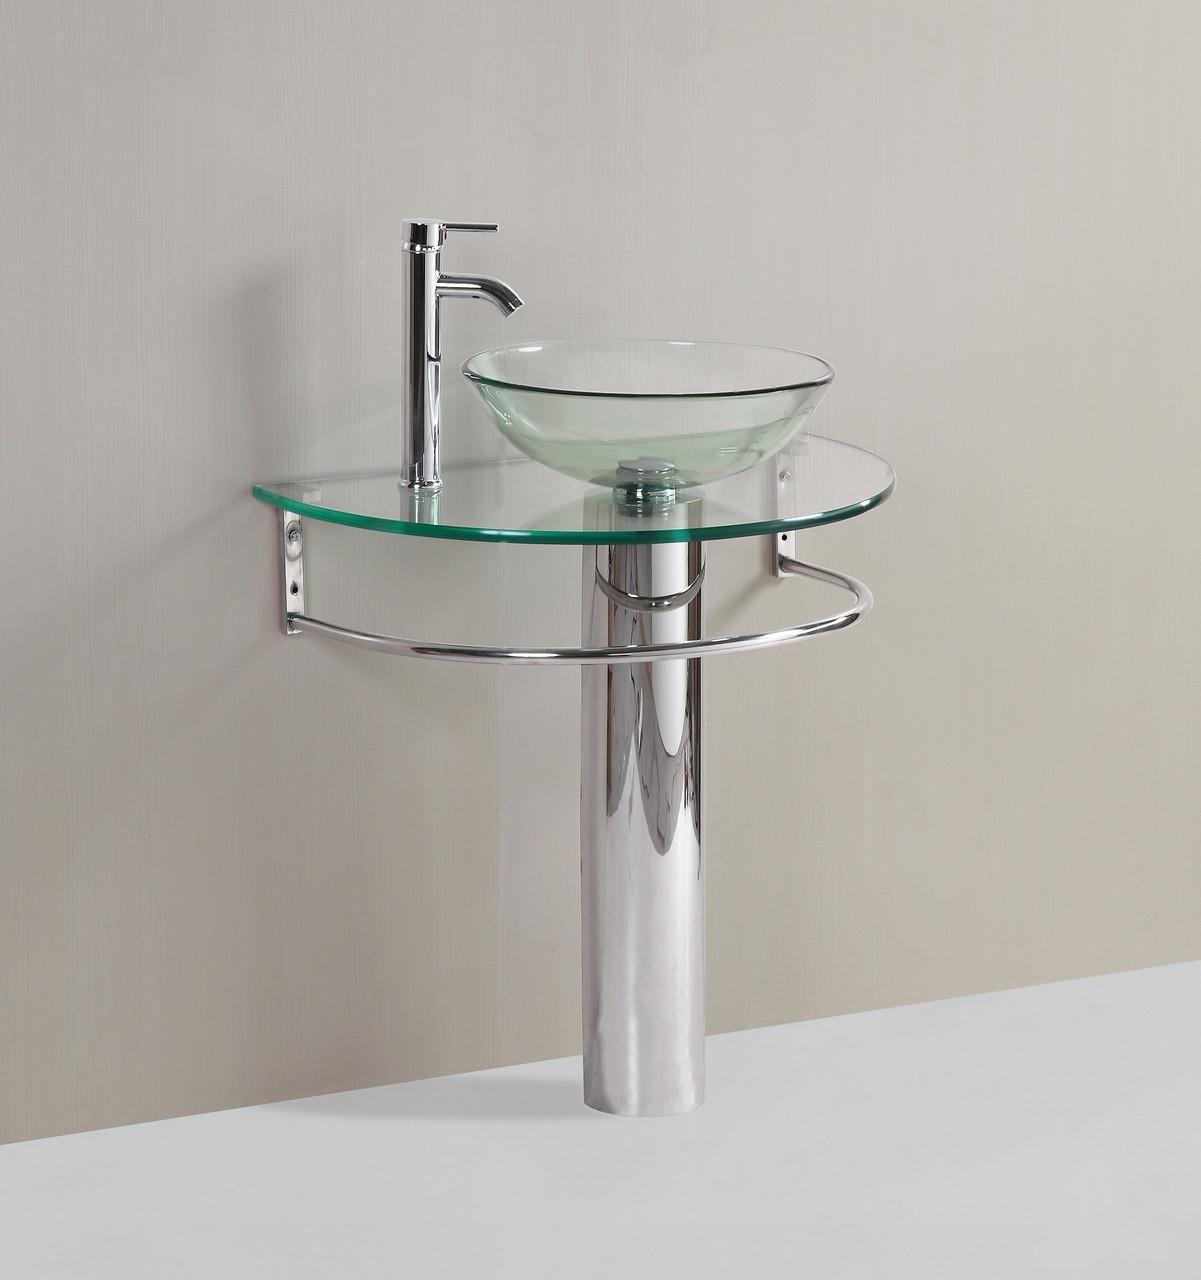 Modern Glass Bathroom Vanity Pedestal Clear Glass Vessel Sink Faucet Lv 006